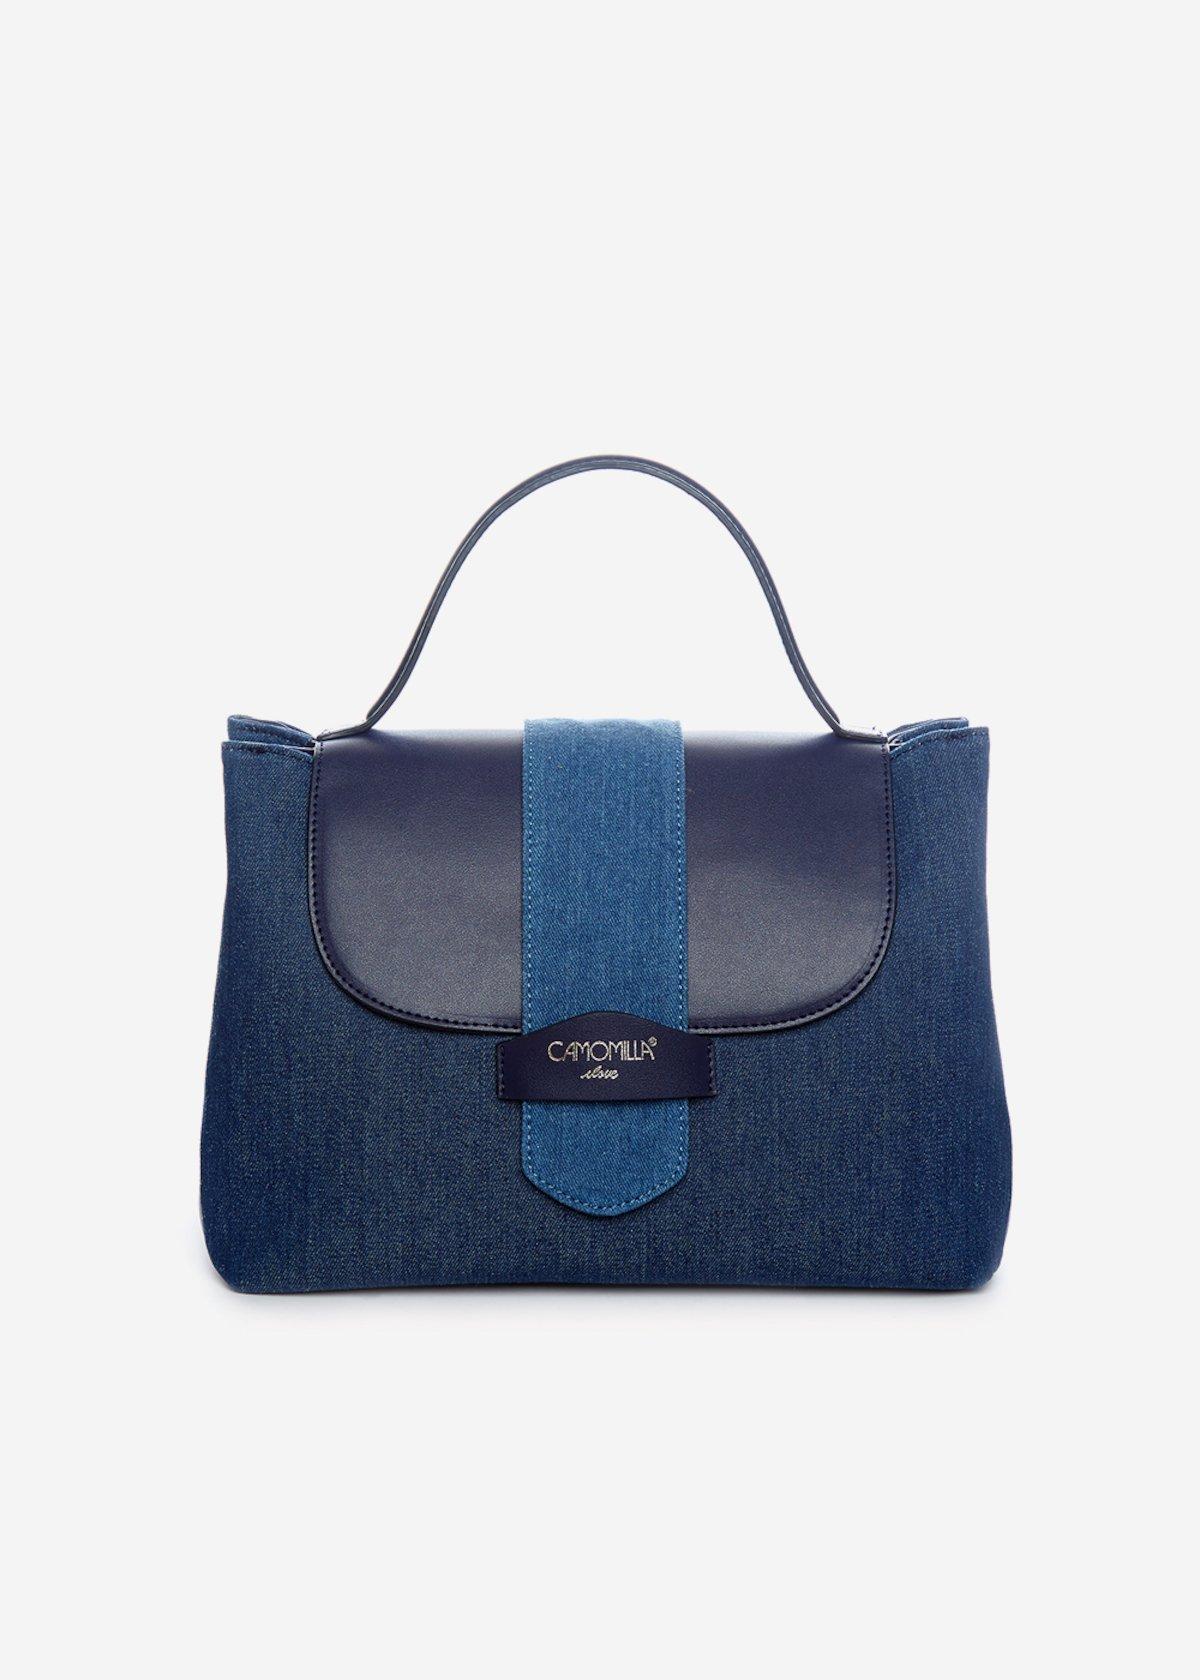 Binnys handbag in faux leather with removable shoulder strap - Dark Denim